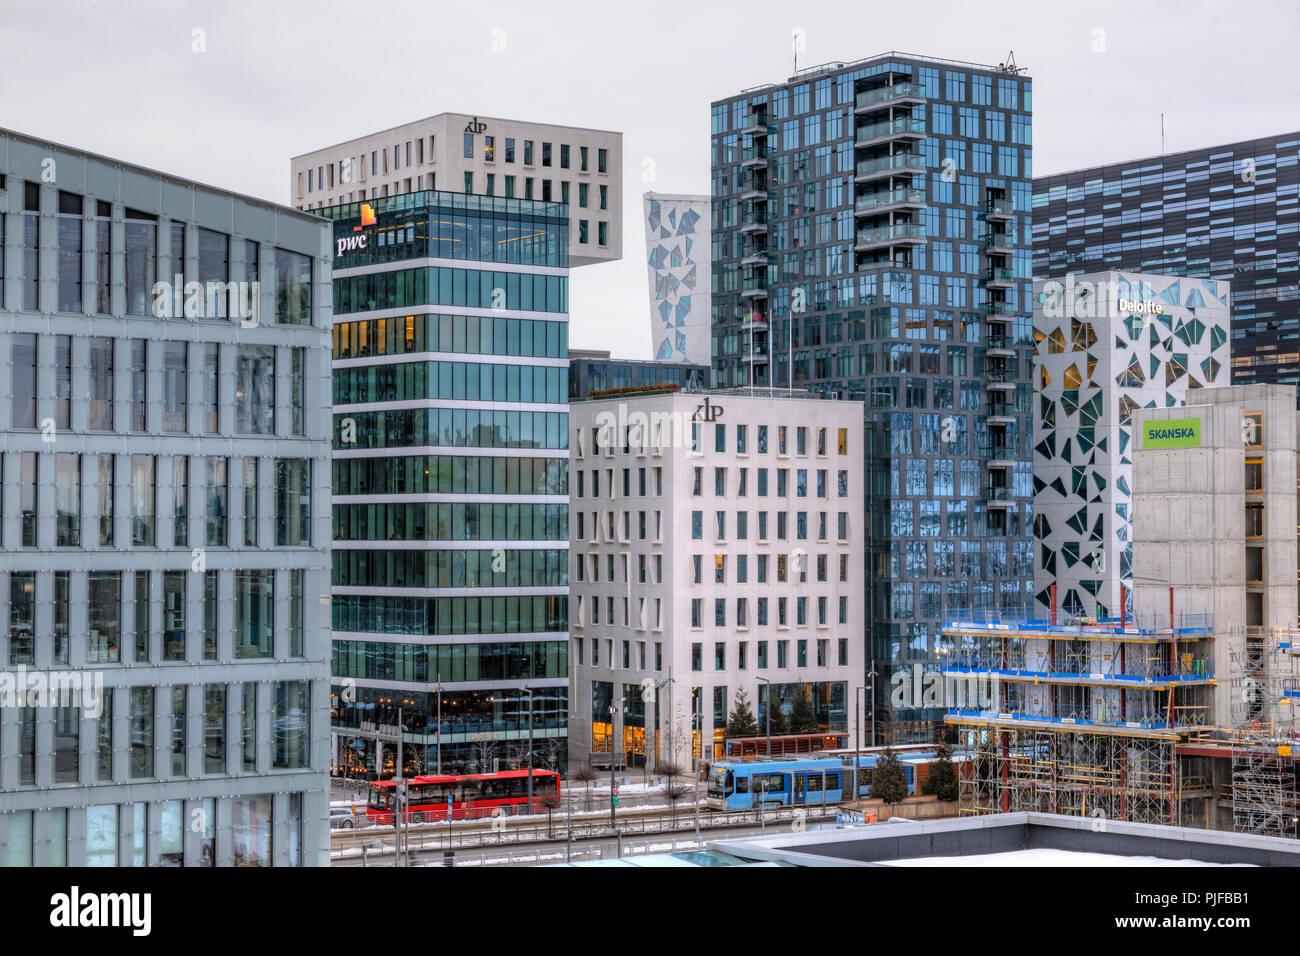 Oslo, Barcode, Norway, Europe - Stock Image